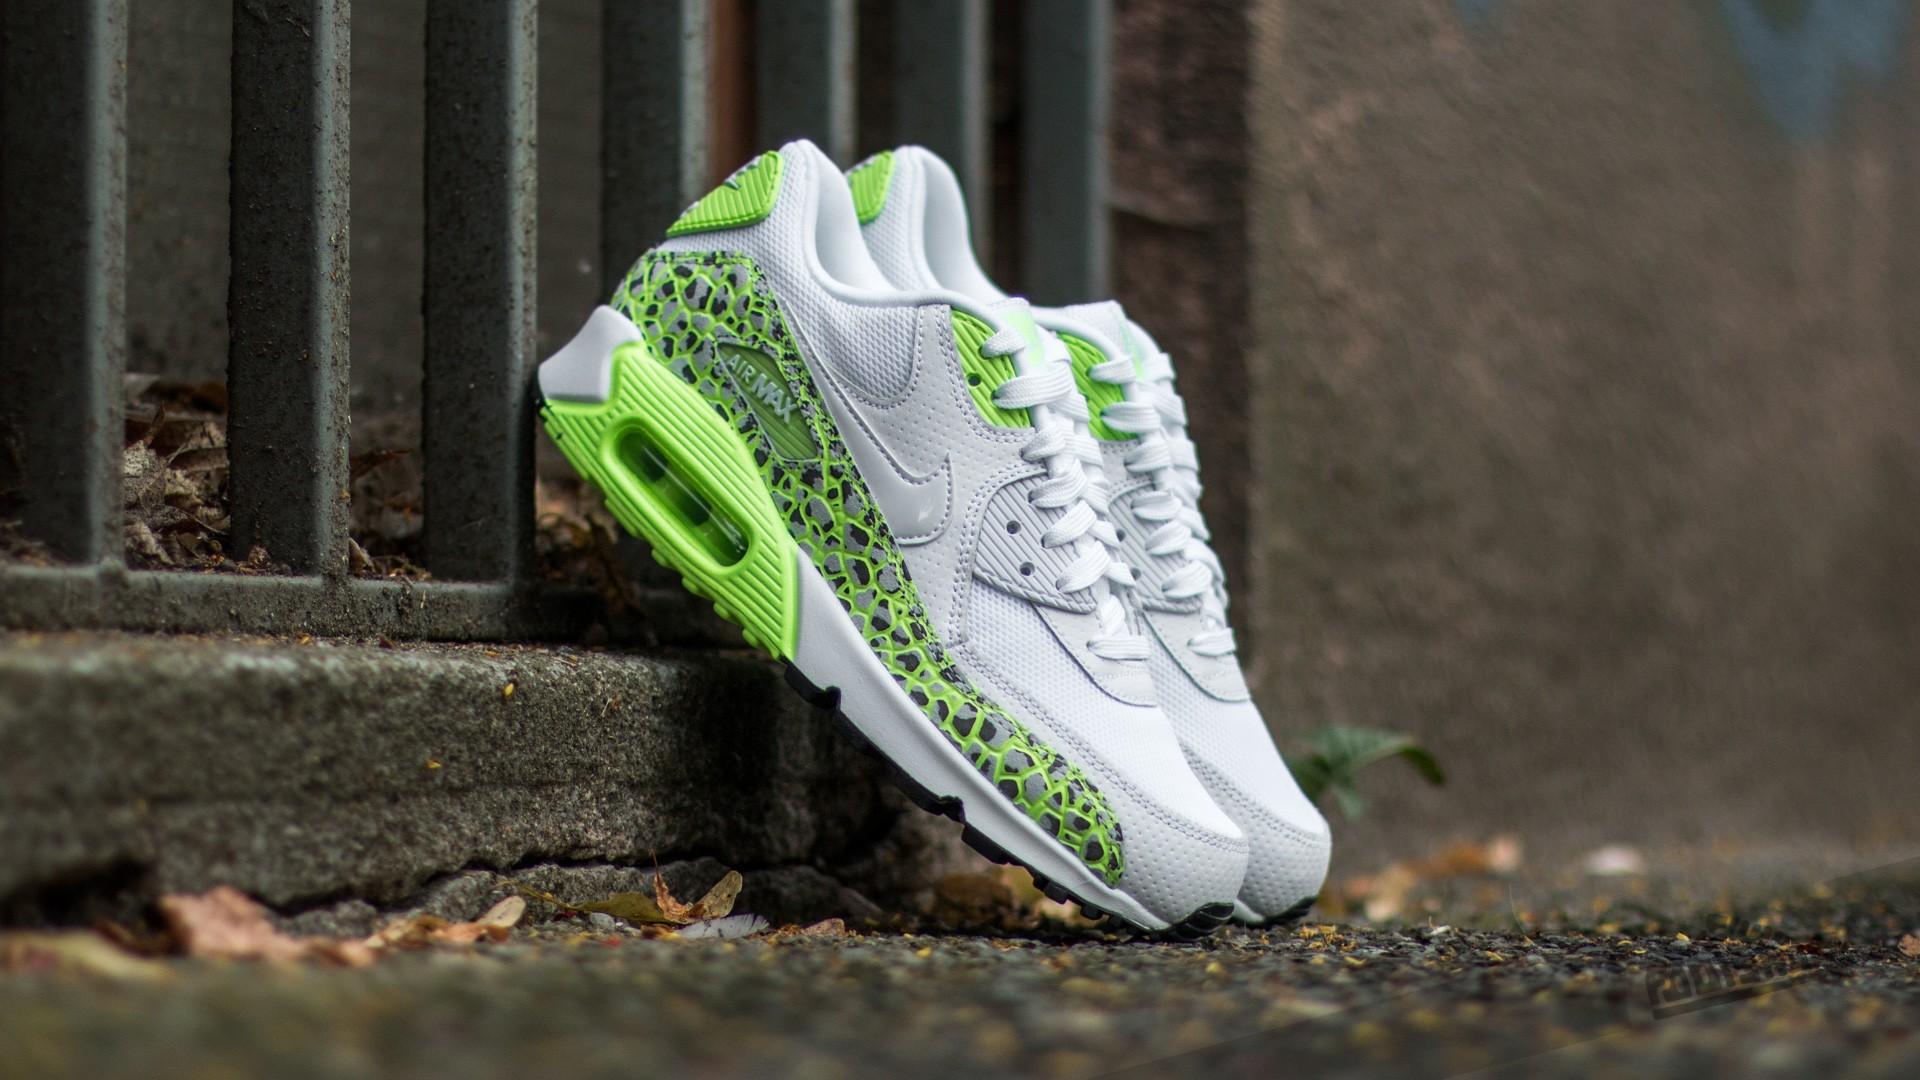 separation shoes 70ca4 a2f19 Nike Wmns Air Max 90 Premium. White  White-Ghost Green